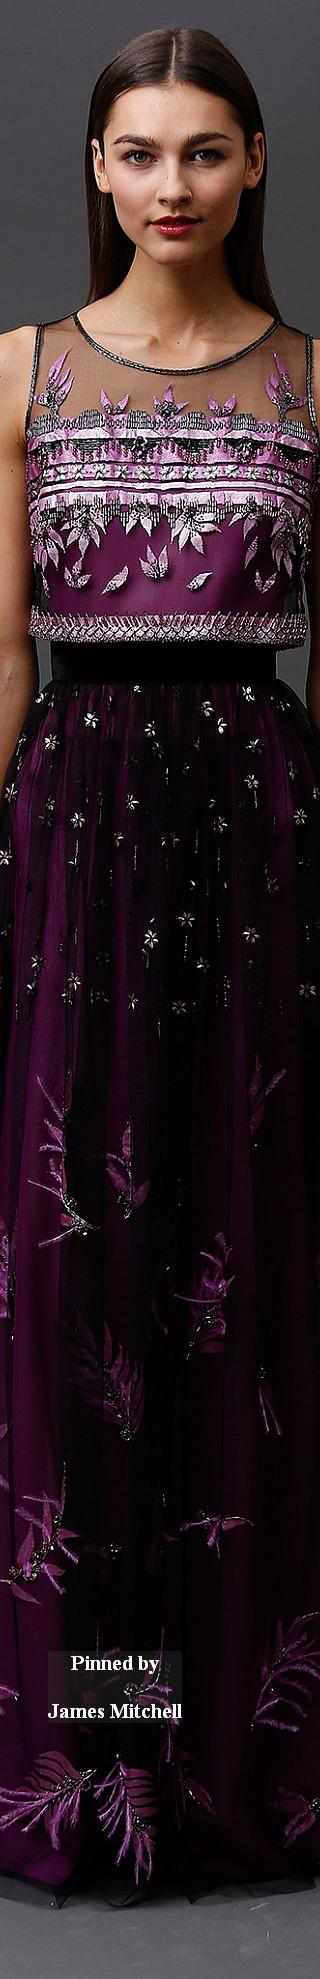 Badgley Mischka Collection Pre-Fall 2015        jαɢlαdy